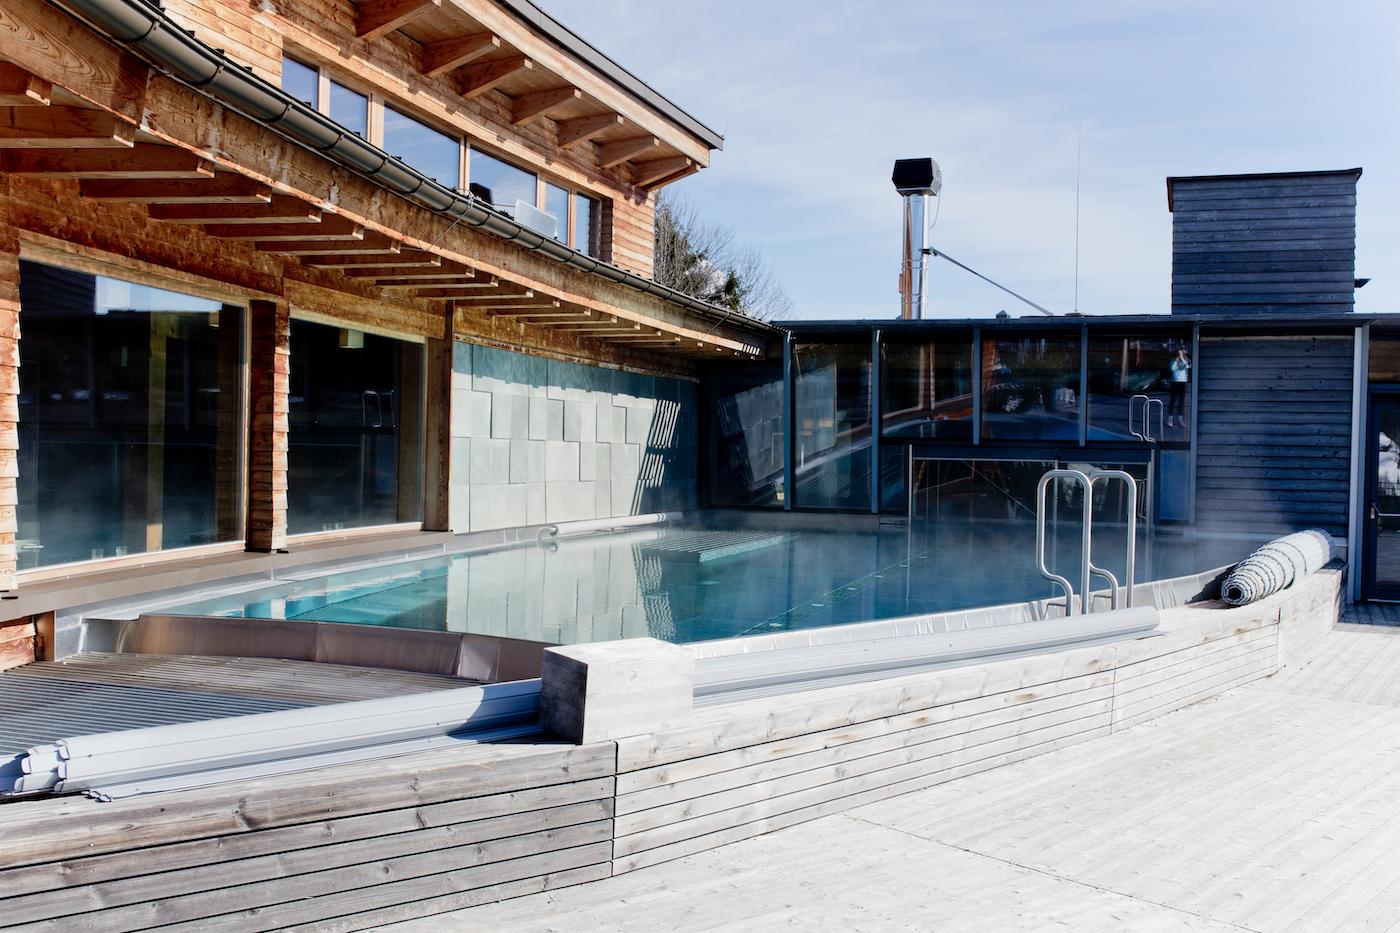 Forsthofalm Leogang Salzburger Land Vacation Austria Wellnesshotel Balance Yoga Hotel| www.thegoldenbun.com